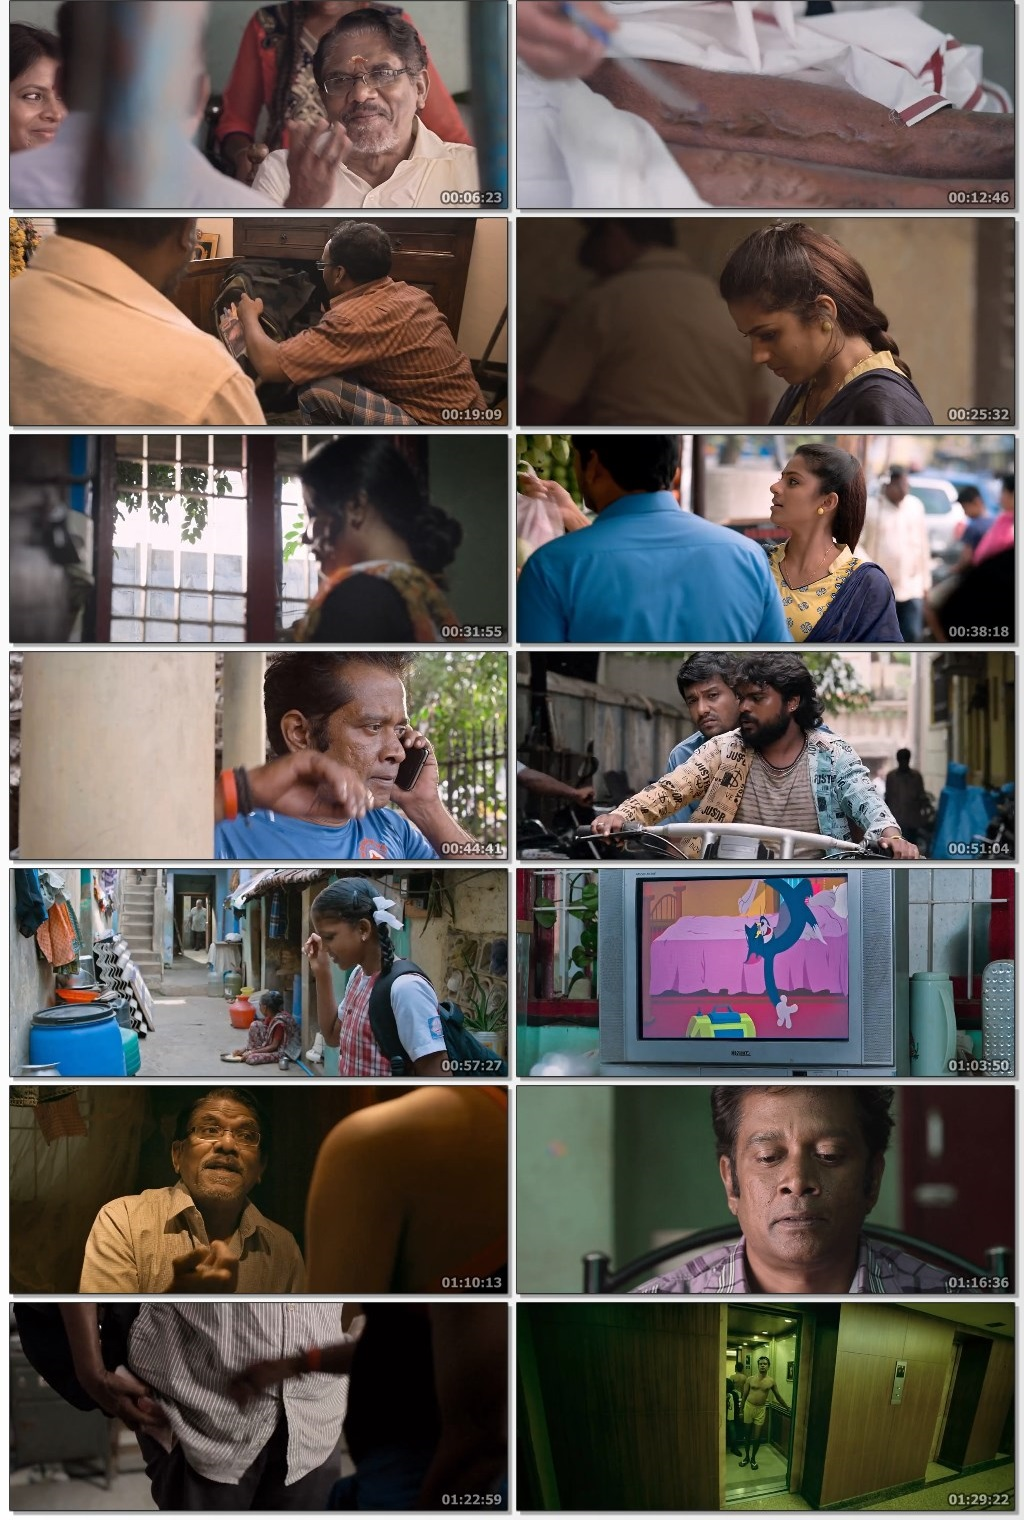 Kurangu-Bommai-Monkey-Bag-2021-www-1kmovies-cyou-Hindi-Dubbed-720p-HDRip-900-MB-mkv-thumbs